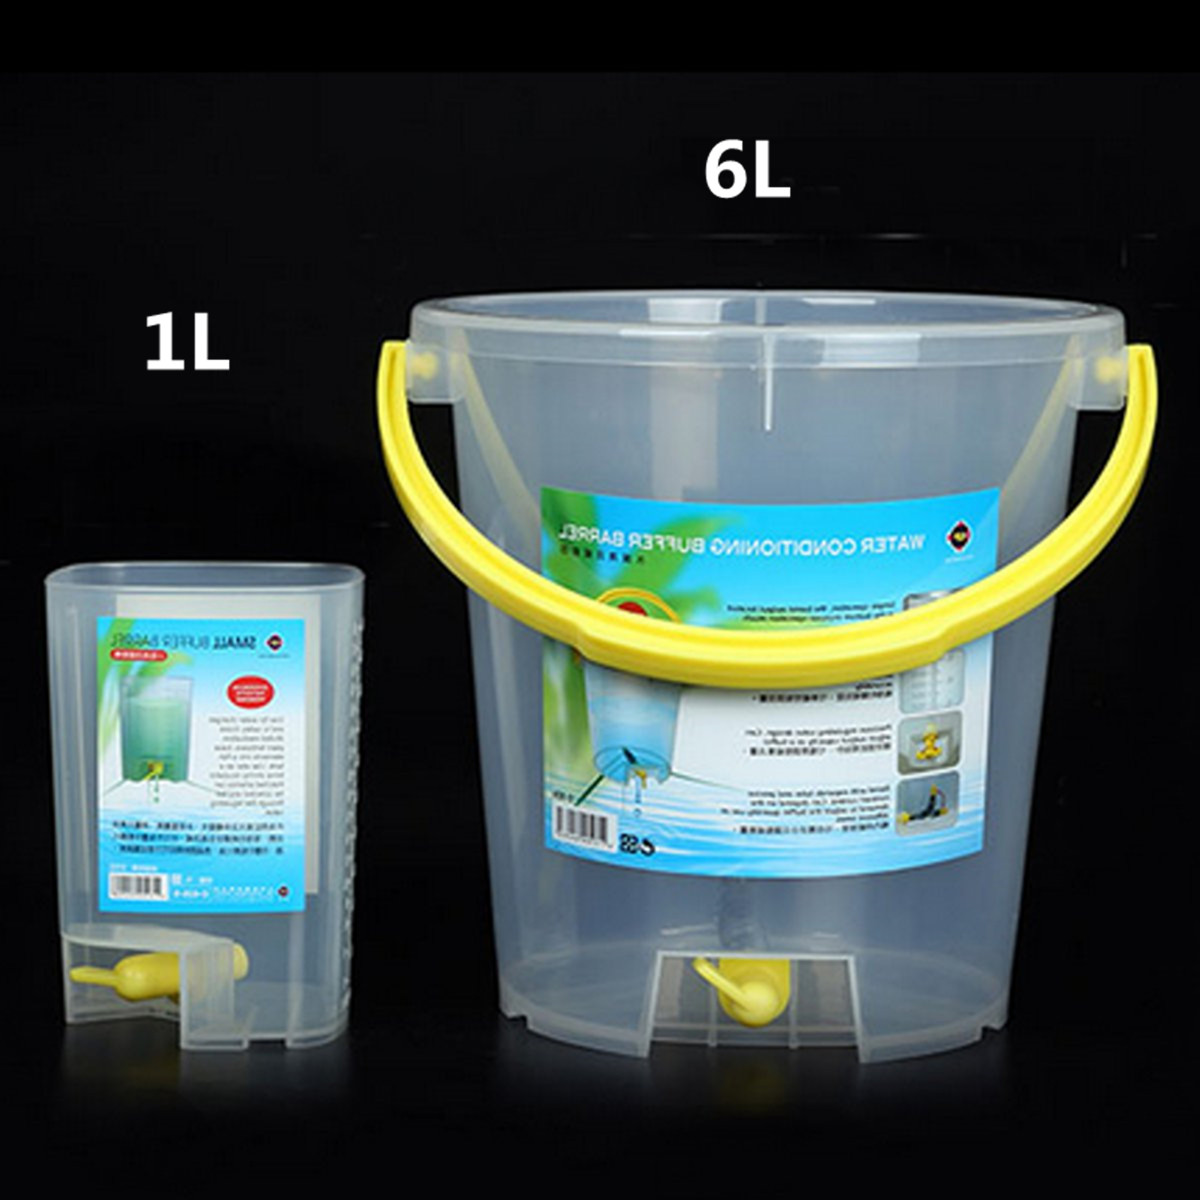 Aquarium Drip Bucket Water Exchange Slow Drop Fish Shrimp Tank Refill Change Buffer Equalizer Fertilization Replenishment